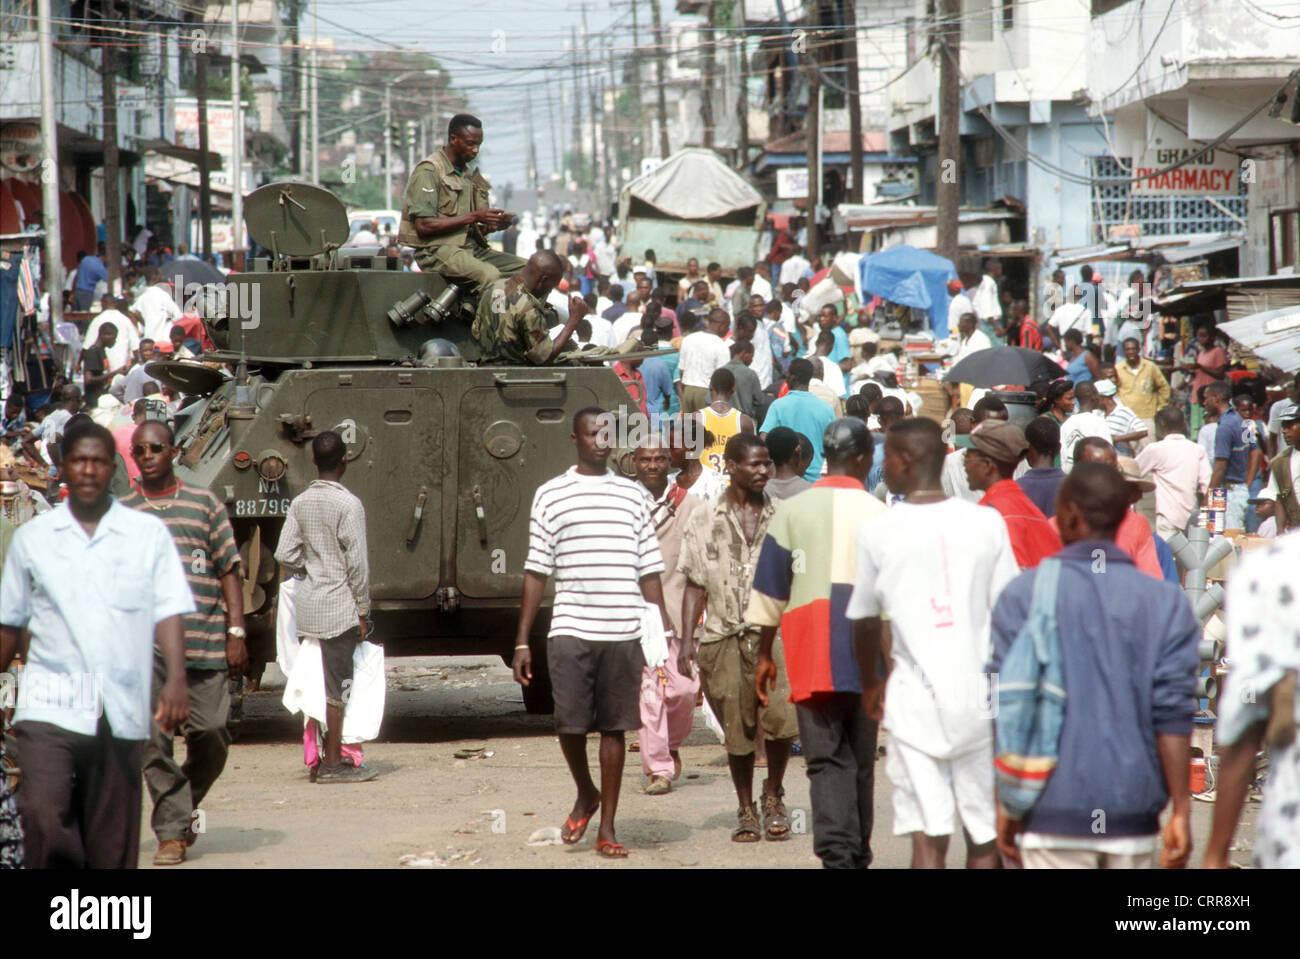 Liberia, ECOMOG peacekeepers in Monrovia. - Stock Image